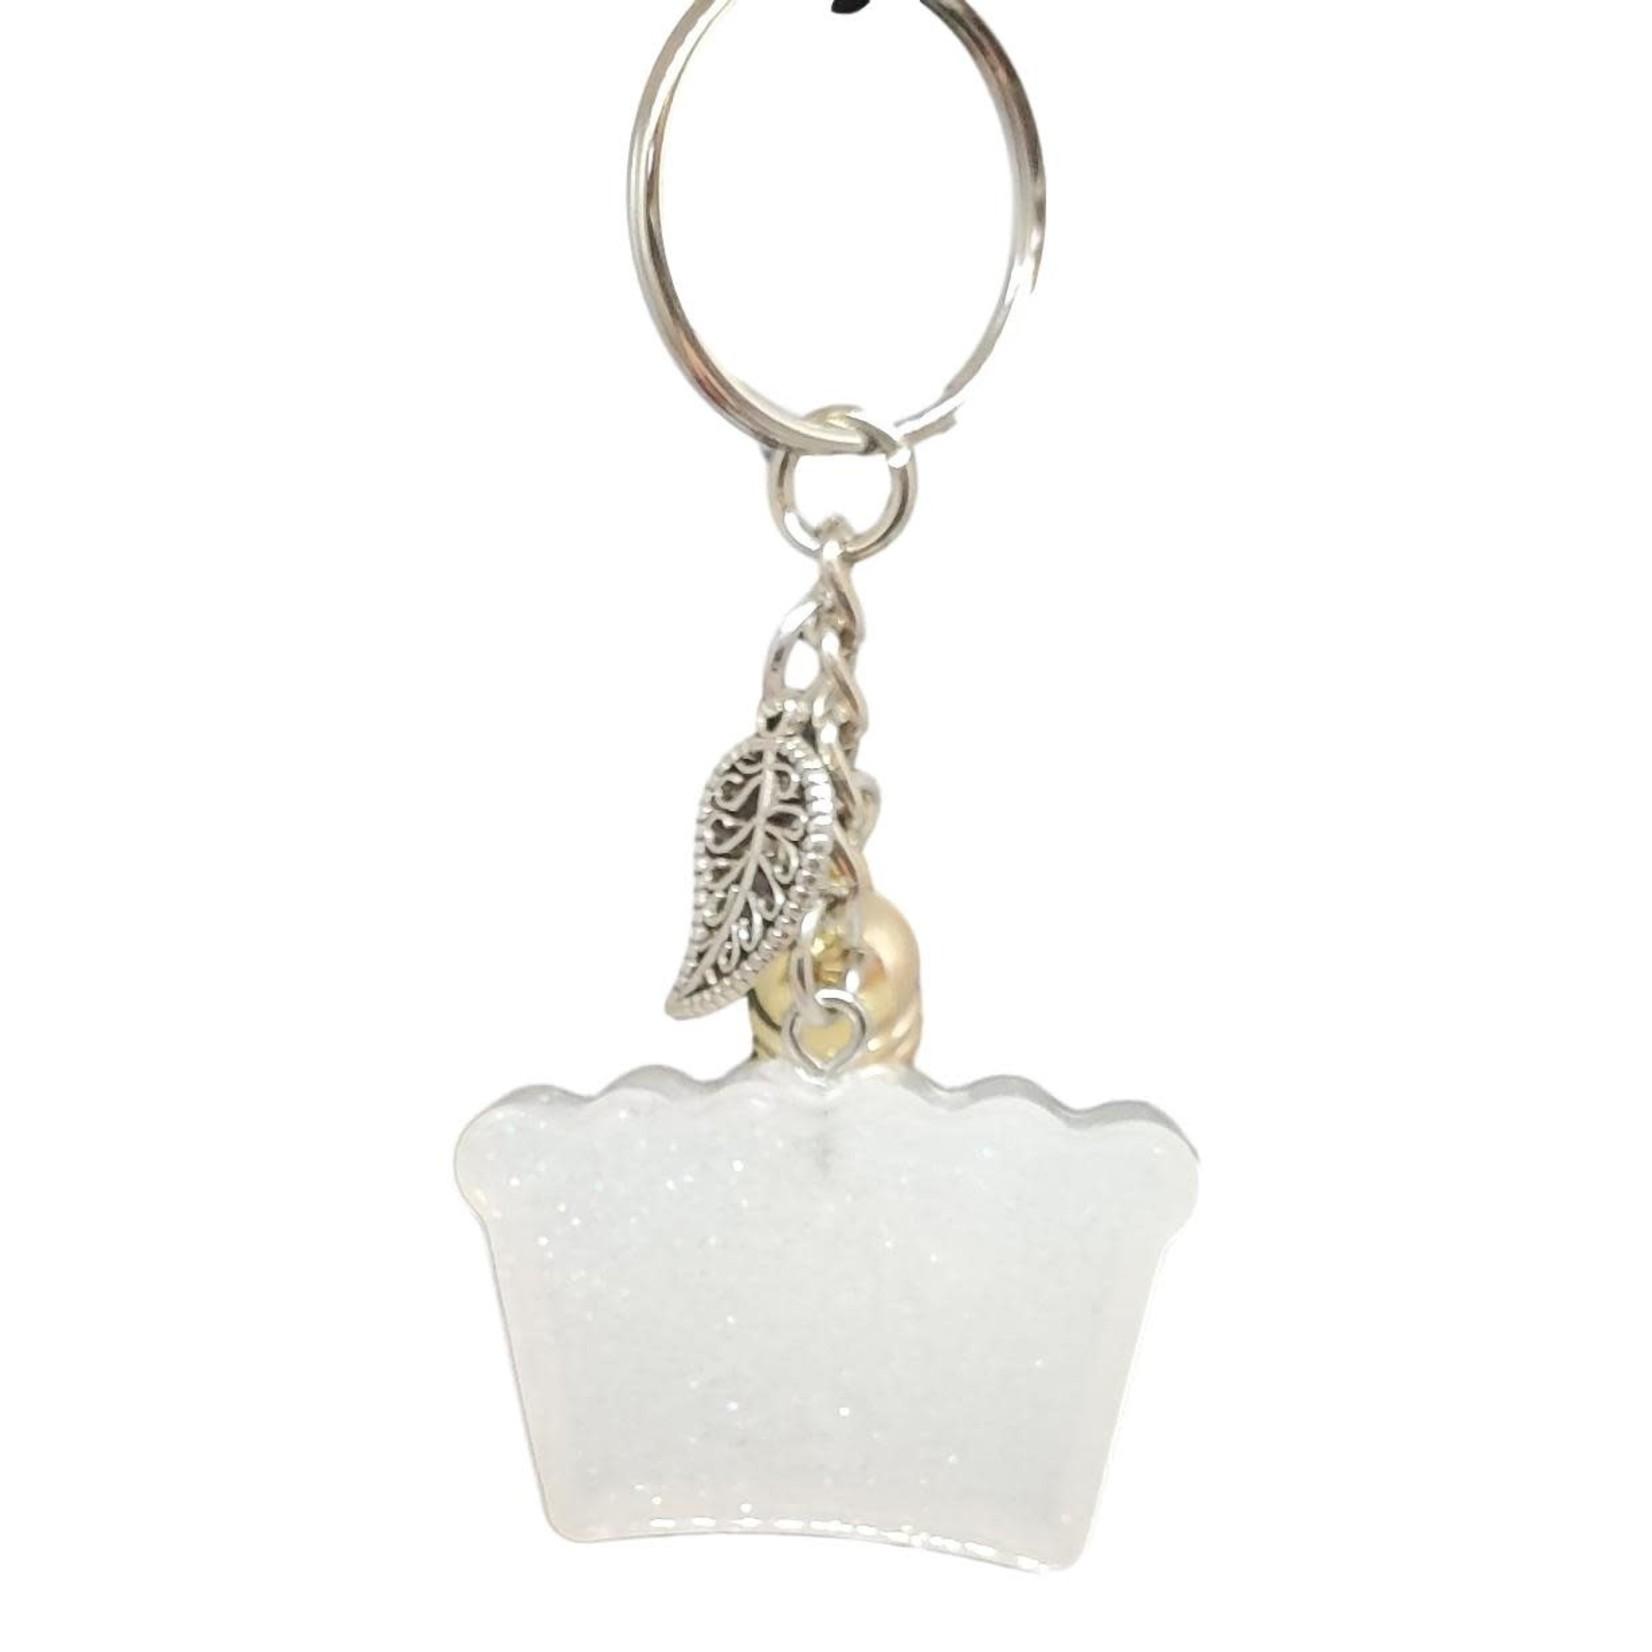 East Coast Sirens White Glitter Crown Key Chain with Tassel Charm